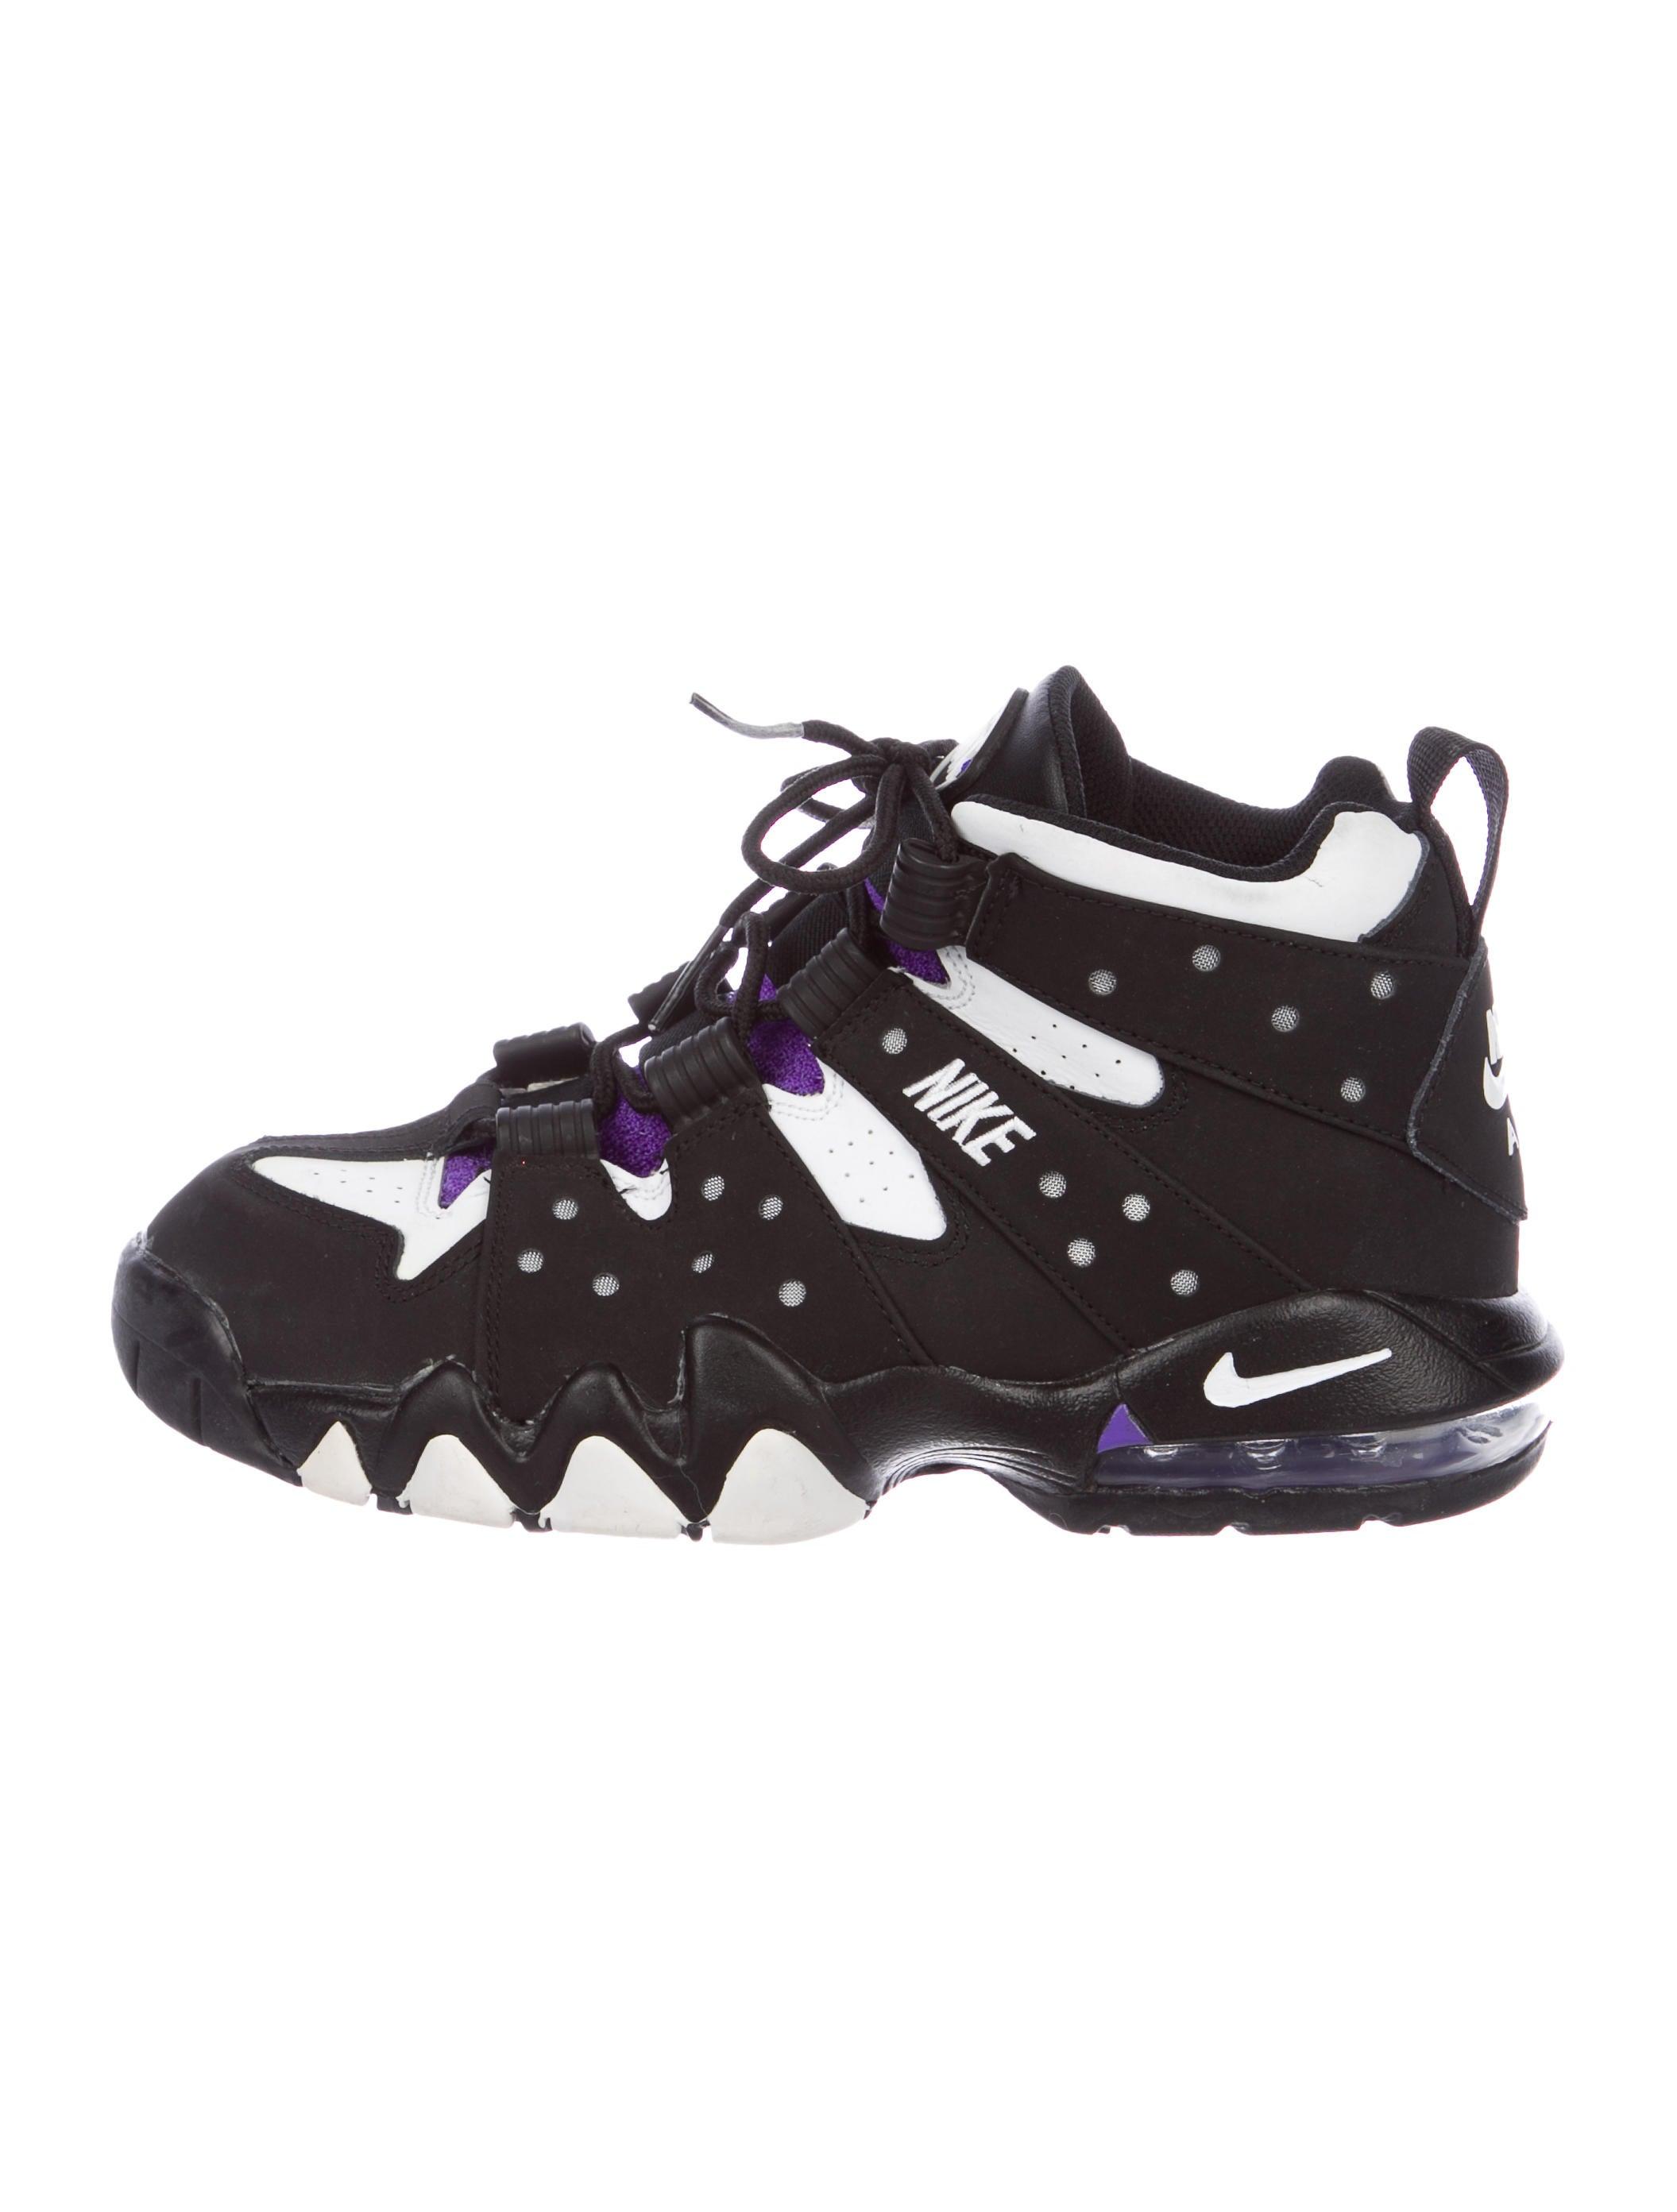 San Francisco 0d3c1 98c1c Nike Boys' Air Max CB 94 Sneakers